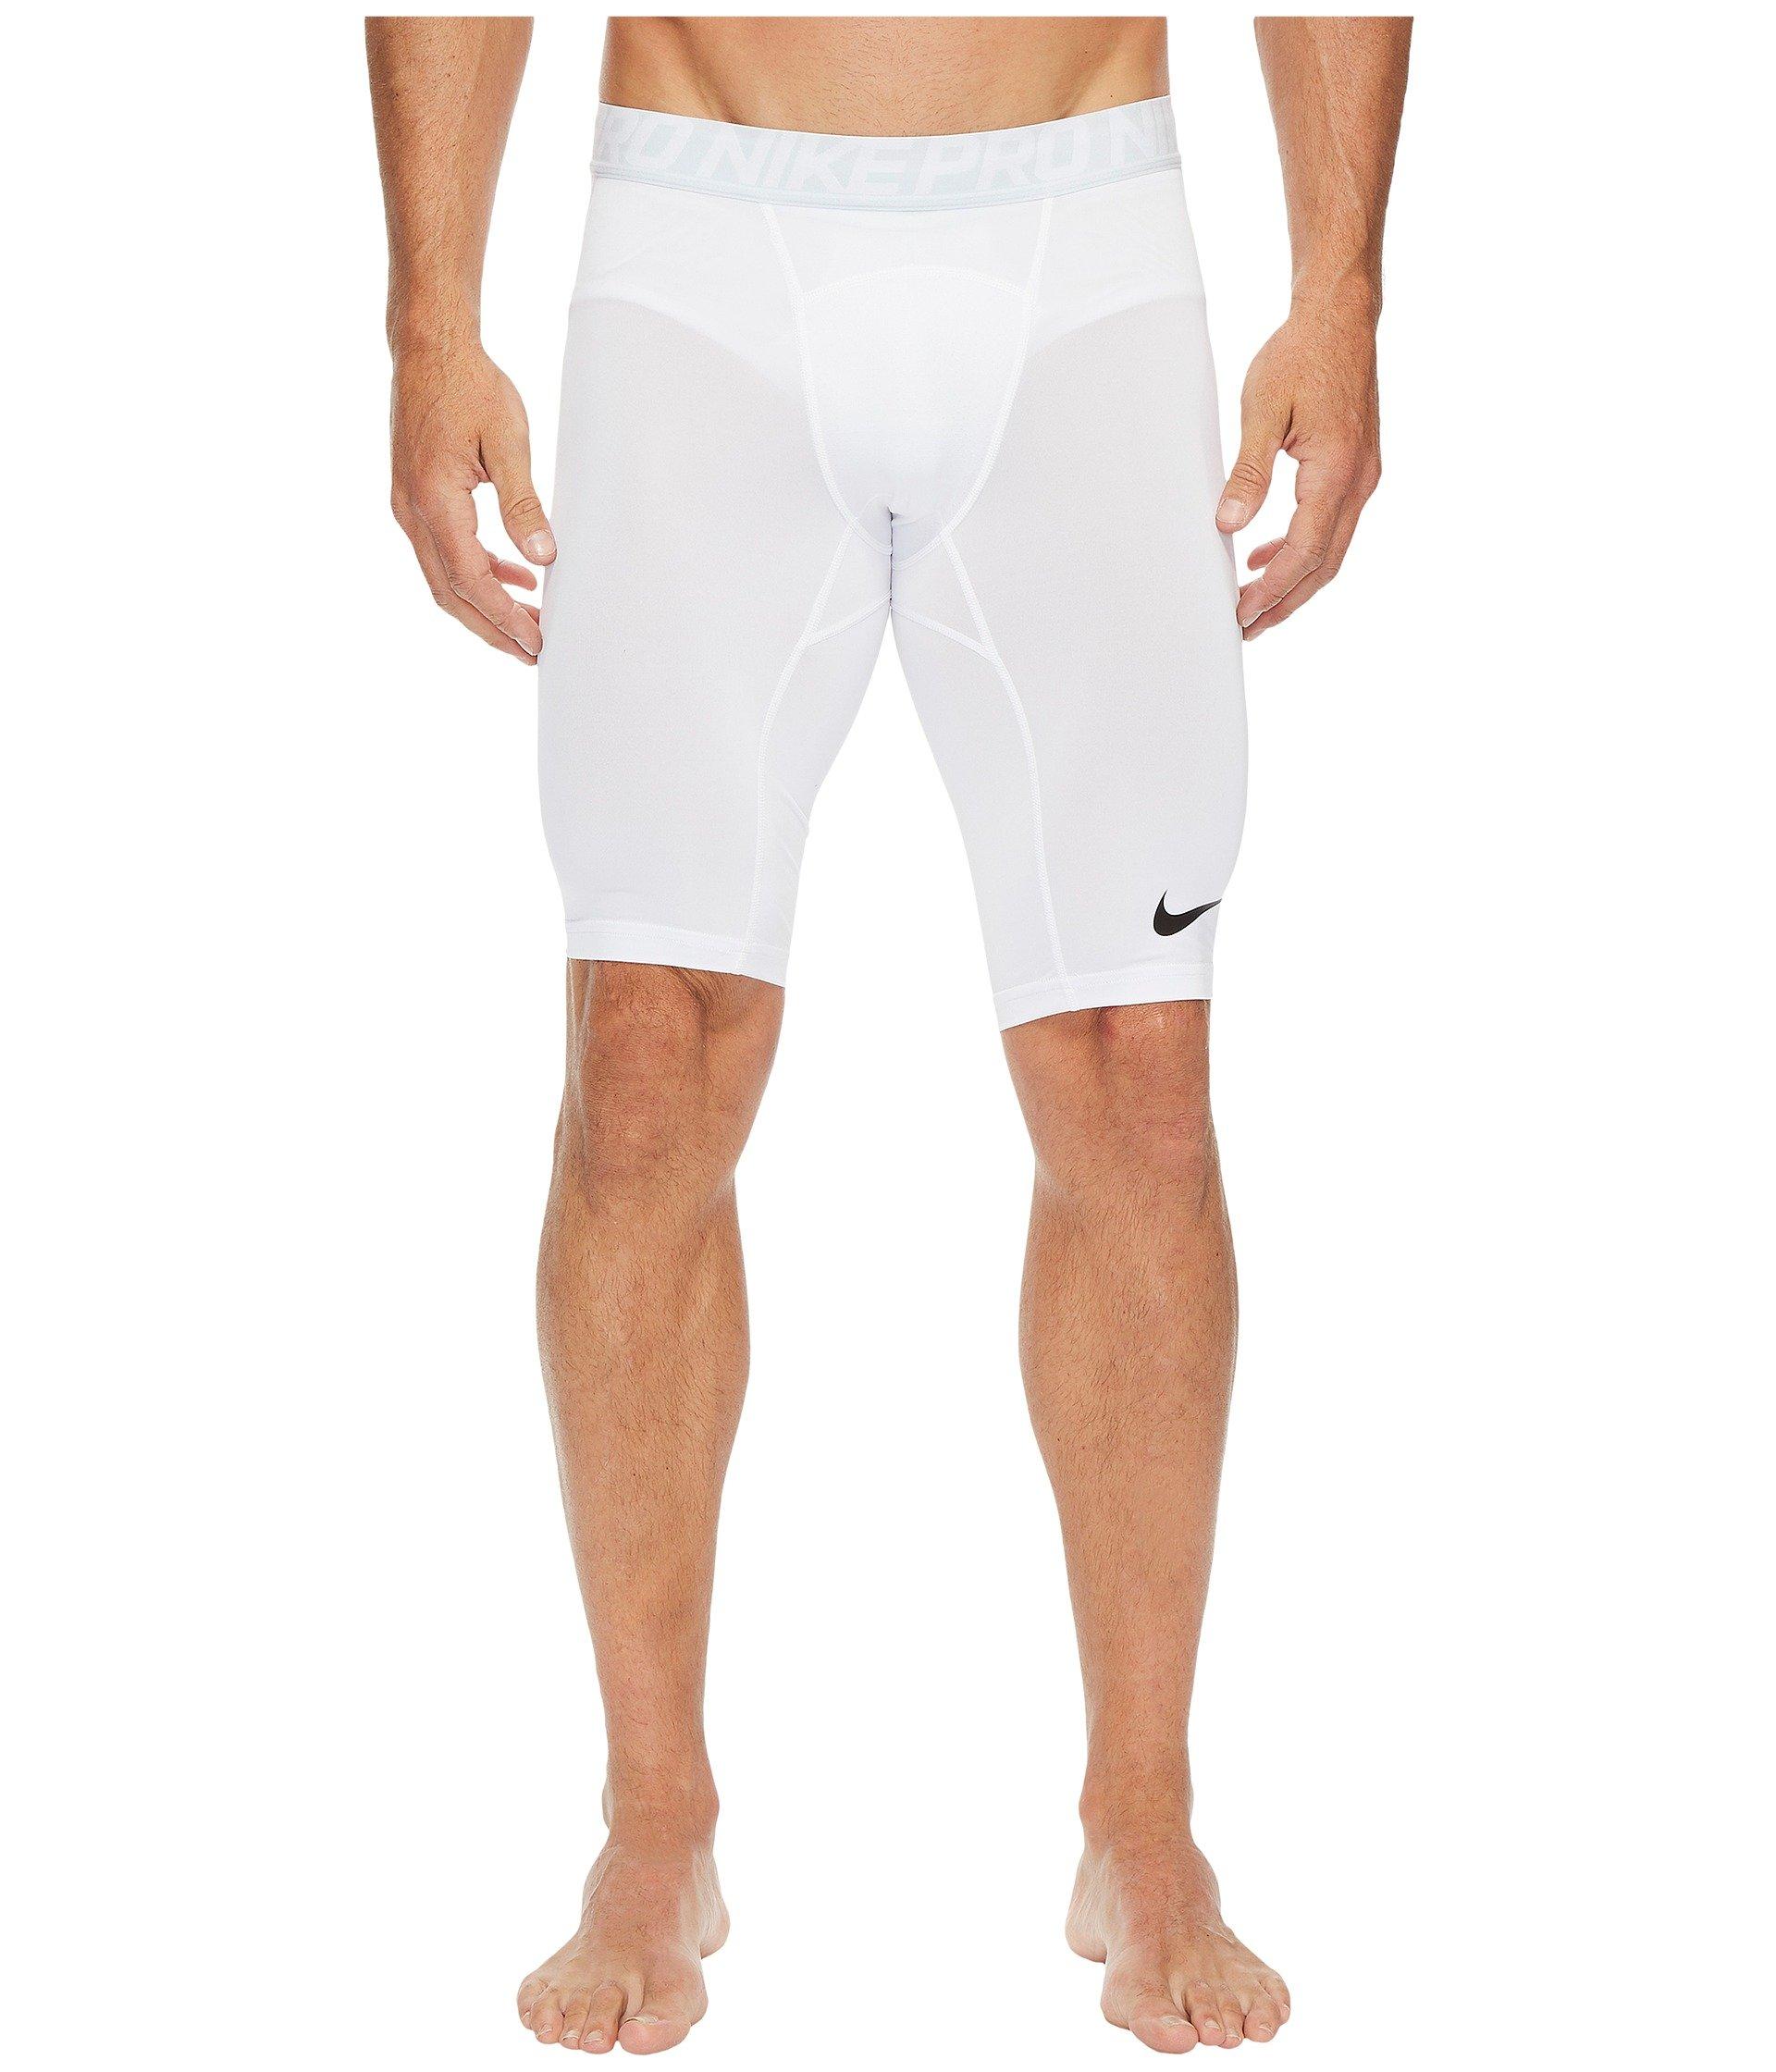 Nike Men's Pro Training Shorts, White/Pure Platinum/Black, Small by Nike (Image #1)